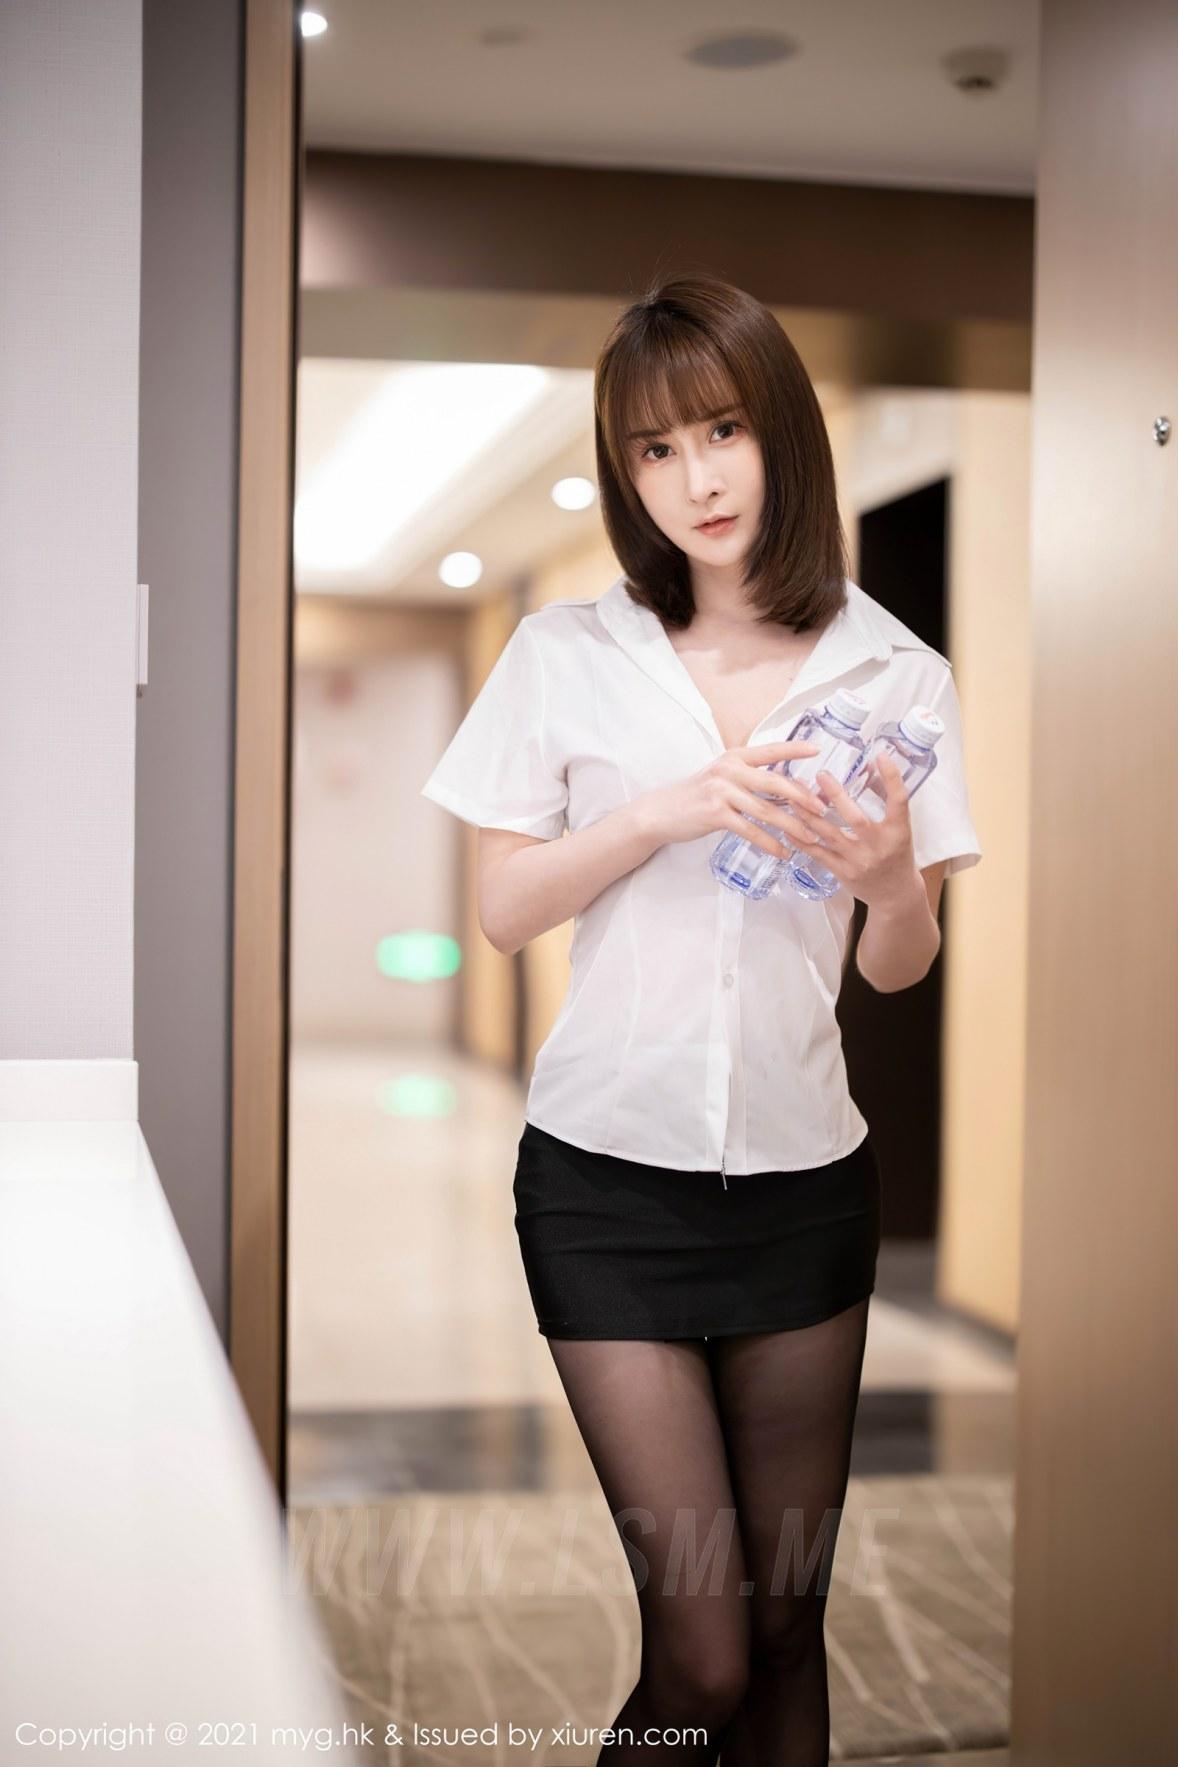 MyGirl 美媛馆 Vol.526 猩红内衣与魅惑黑丝 蔡文钰Abby 性感写真房 - 1